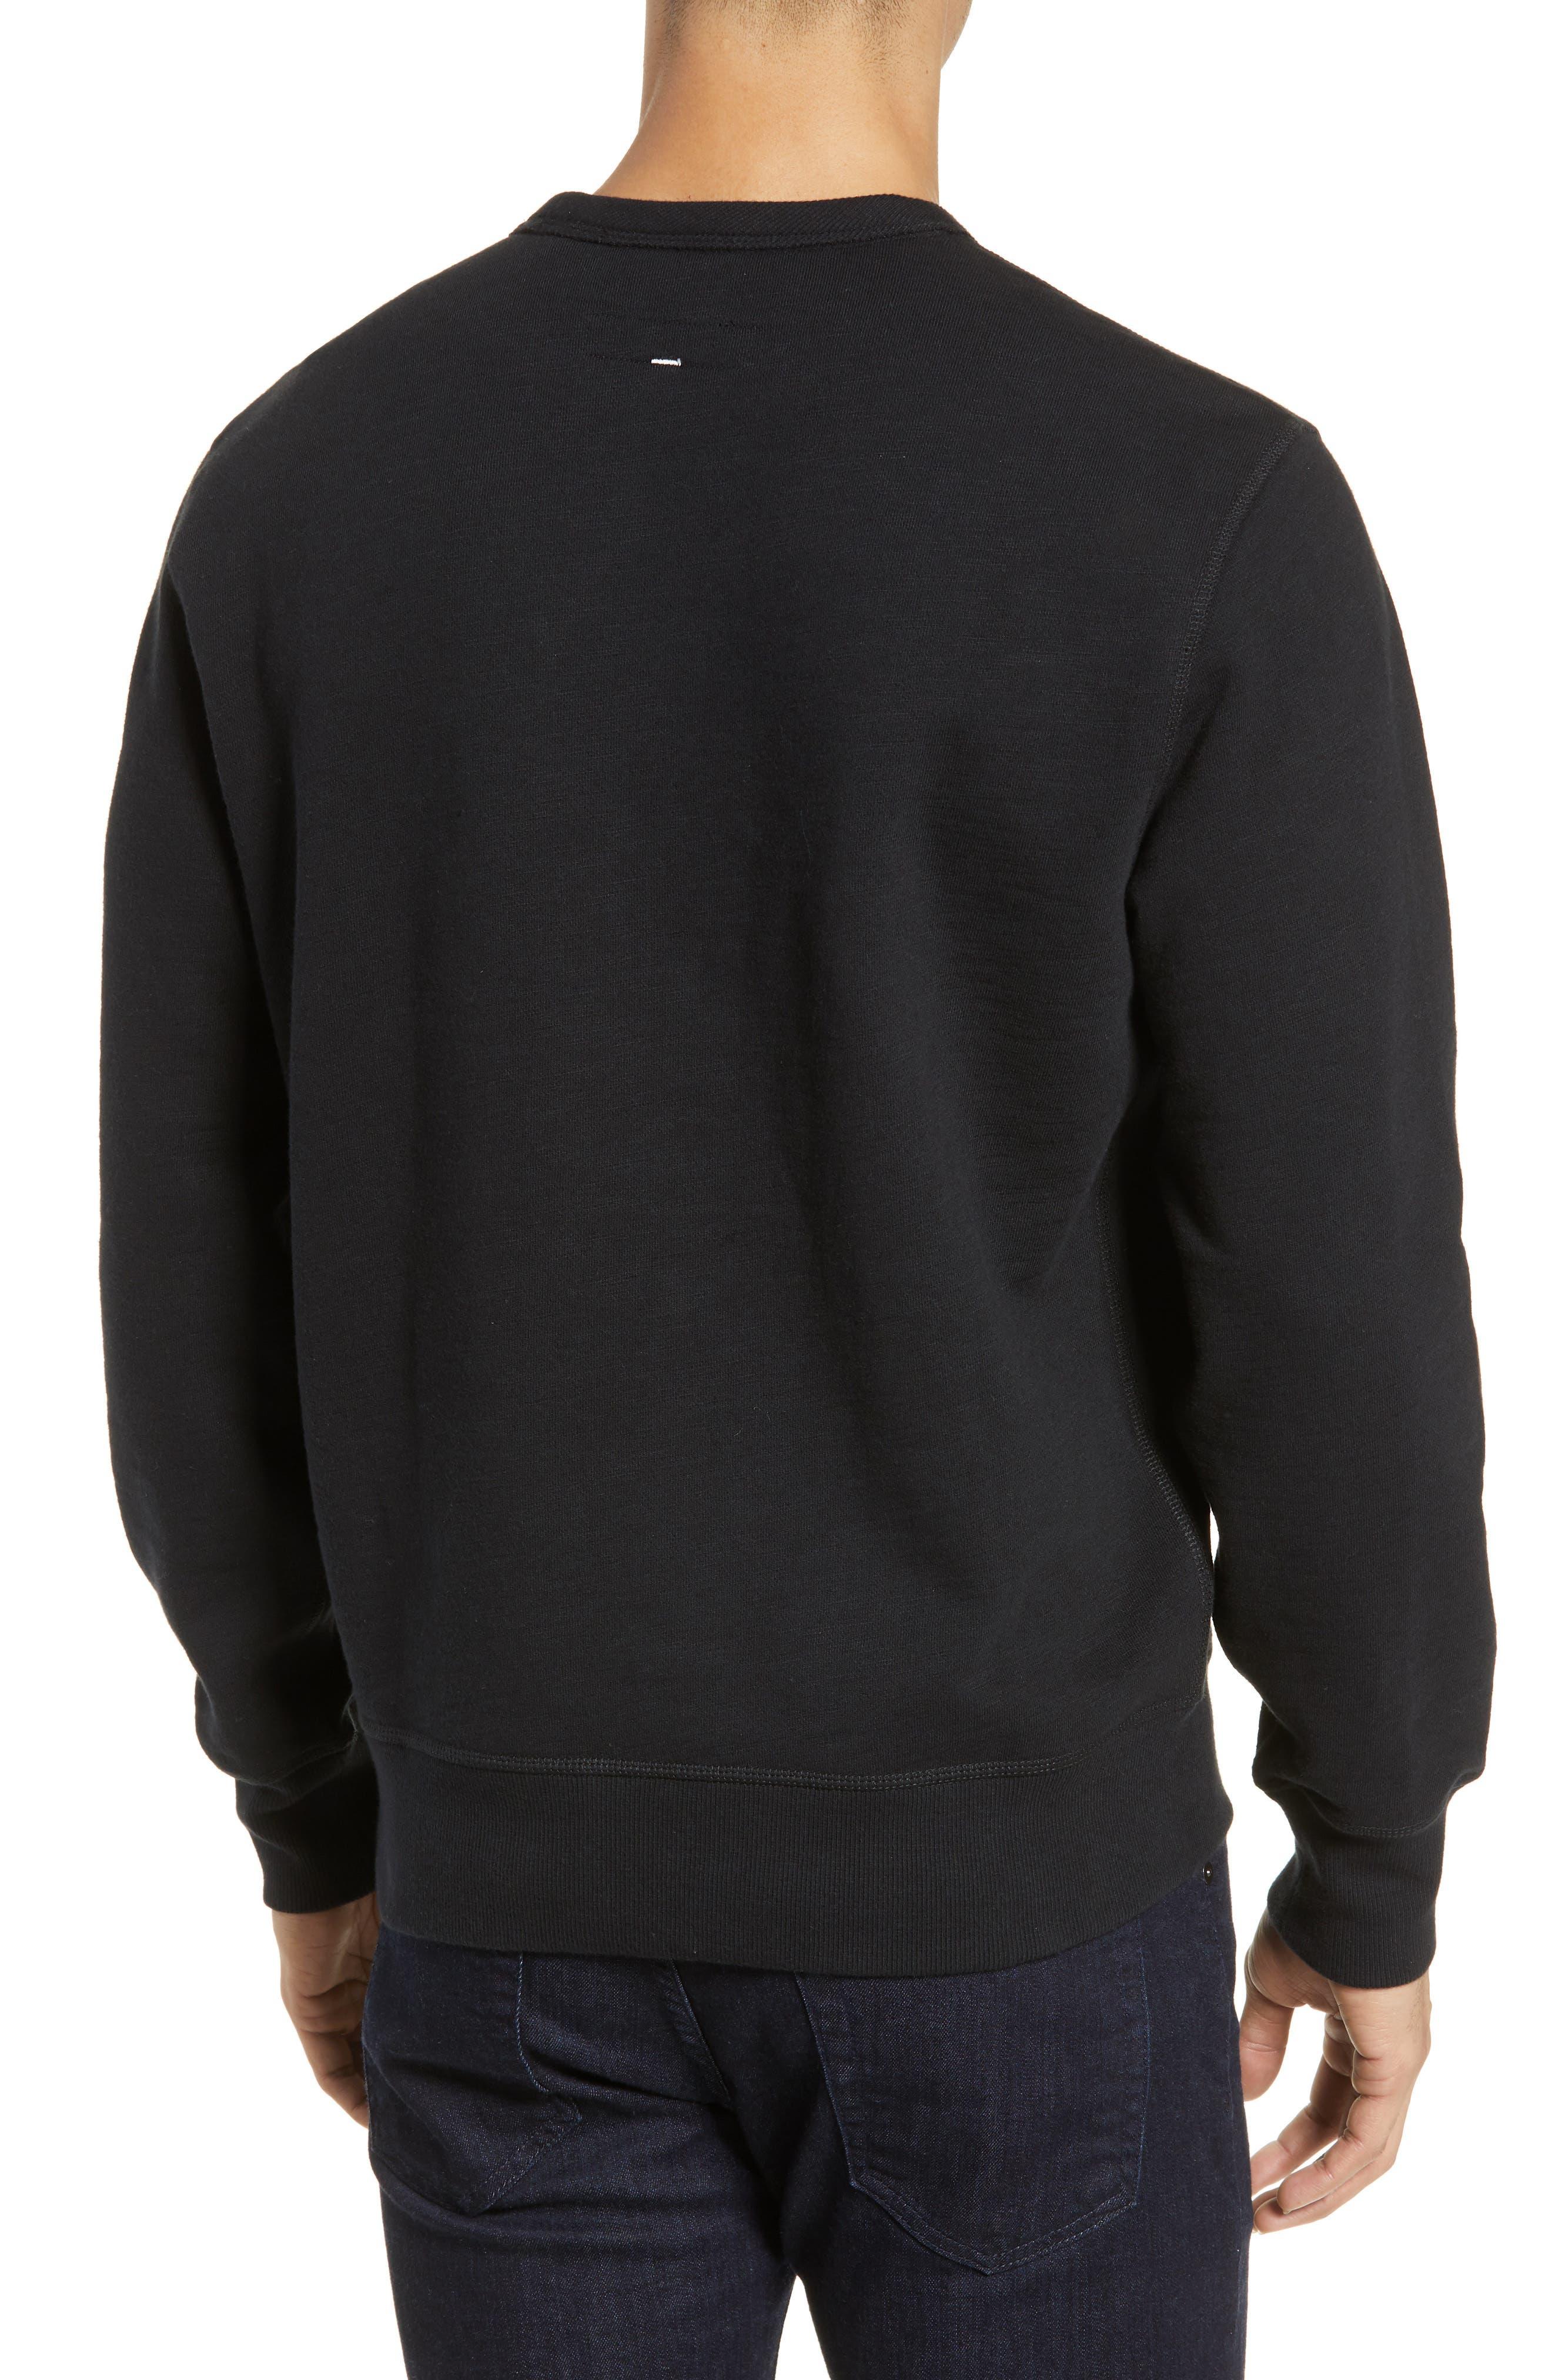 RAG & BONE, Year of the Pig Graphic Sweatshirt, Alternate thumbnail 2, color, BLACK